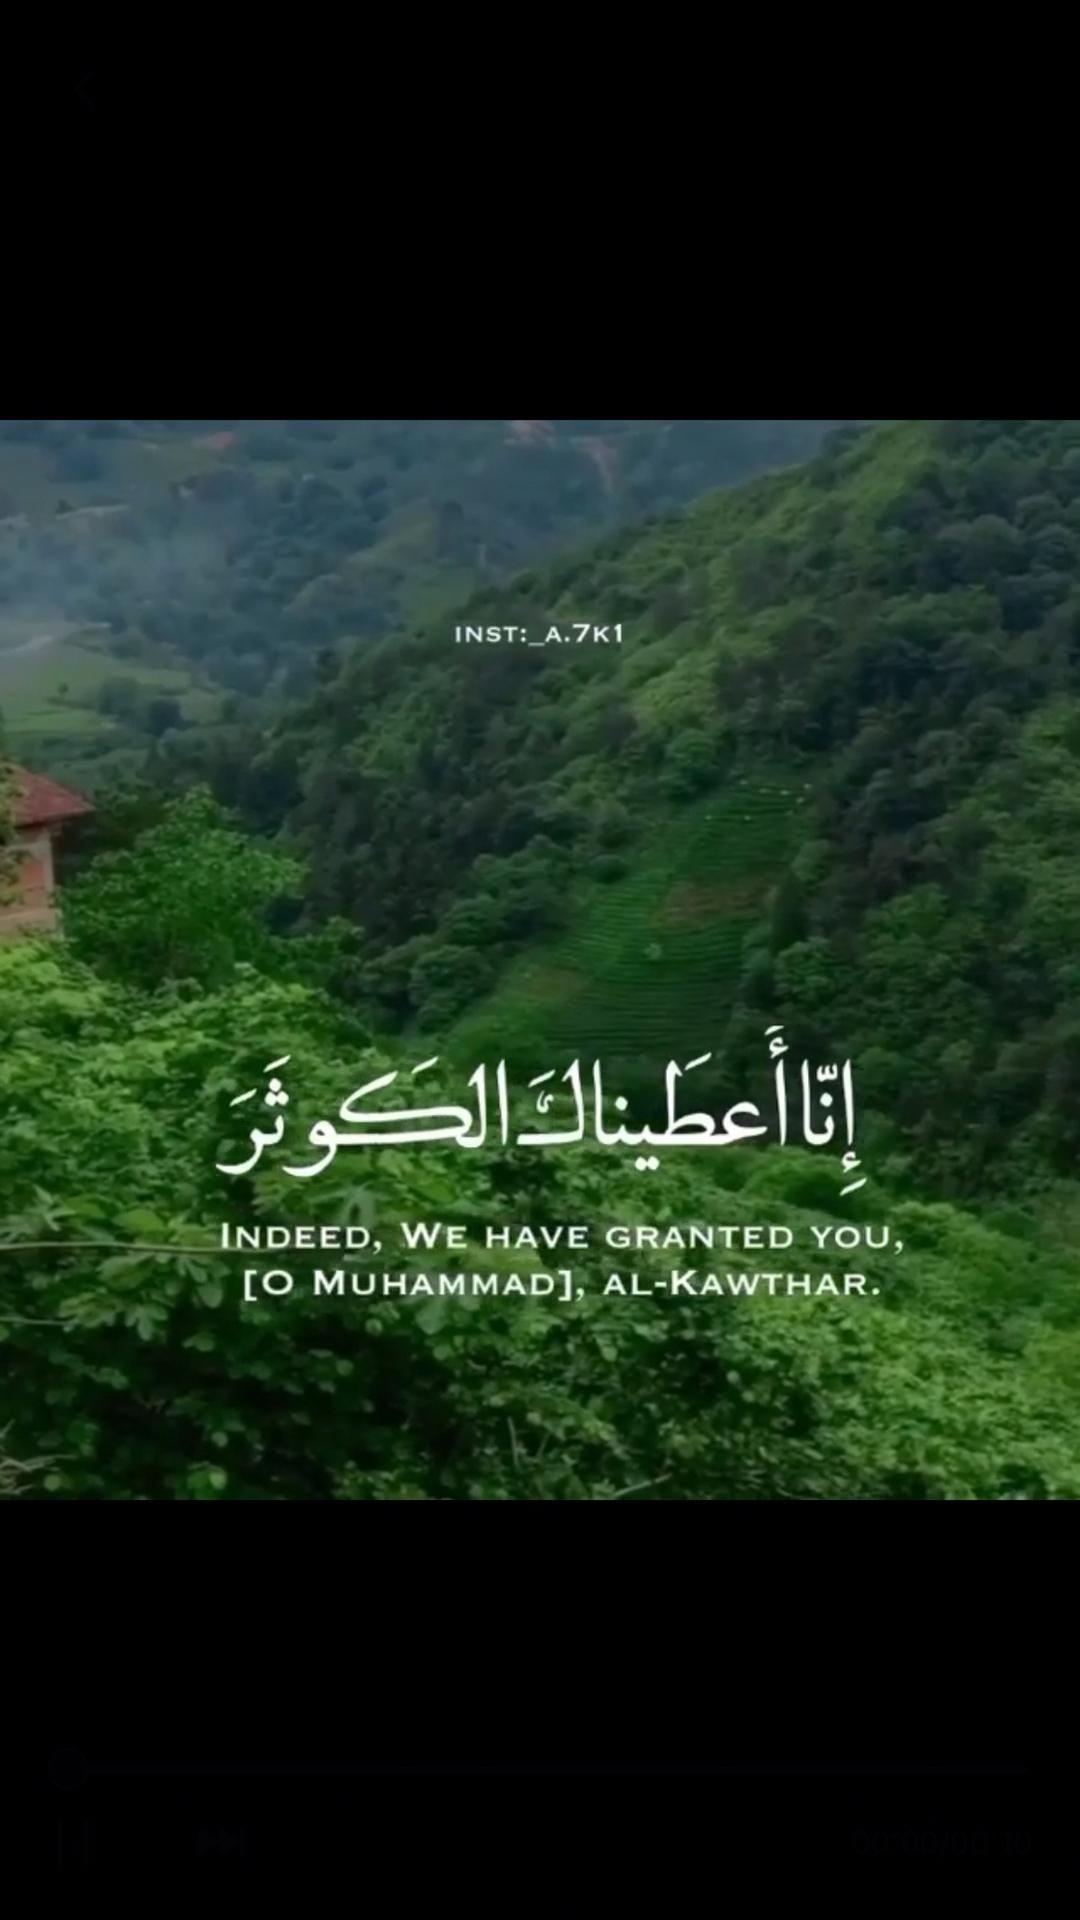 صوت جميل ما شاء الله Video Islamic Phrases Quran Islamic Quotes